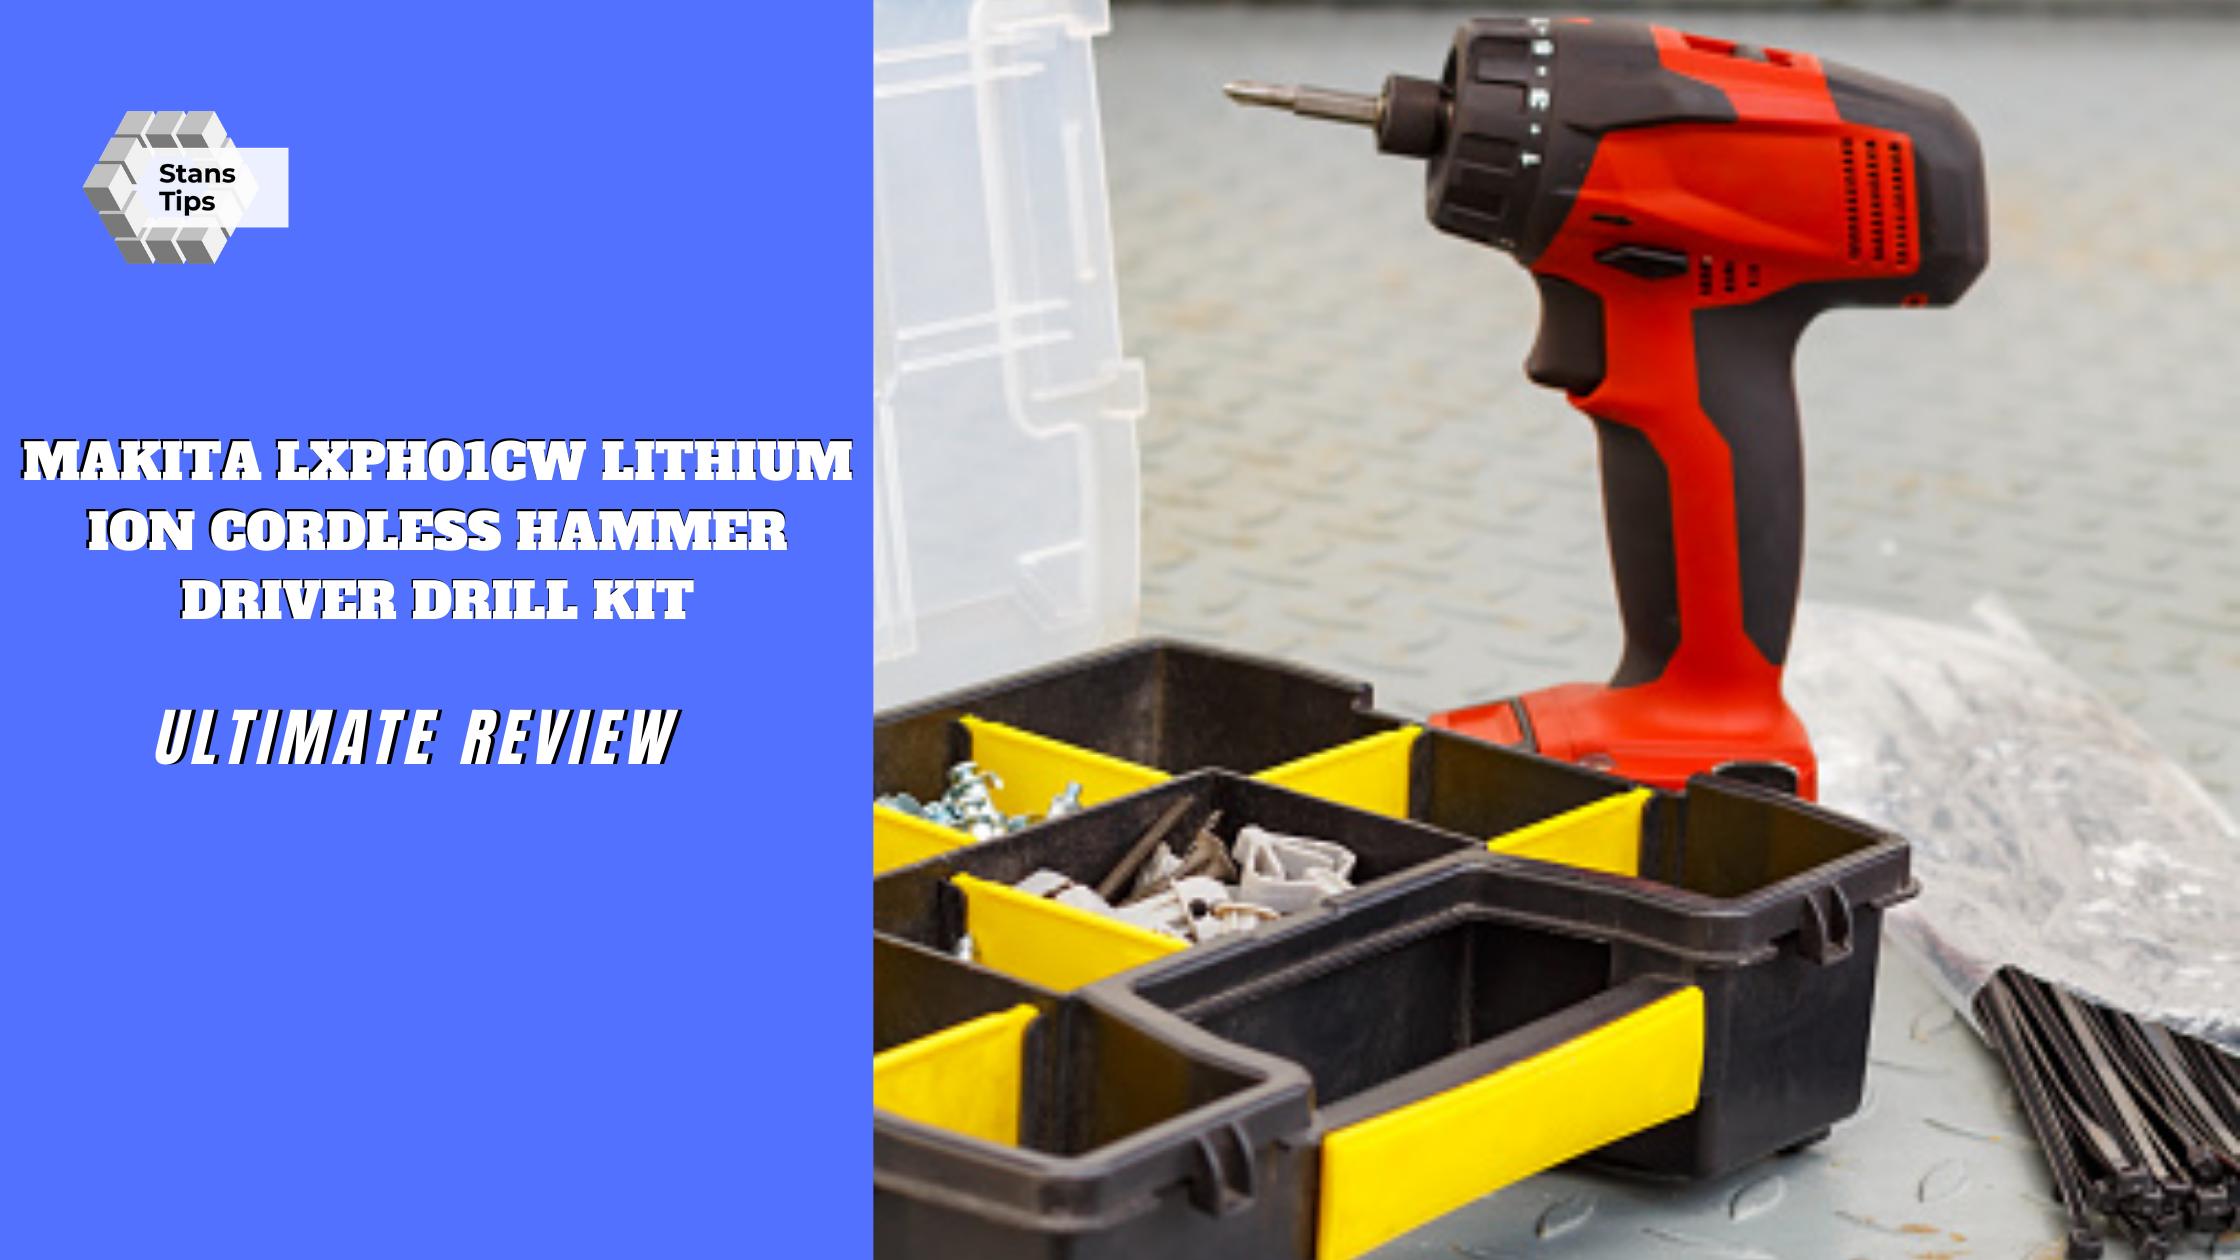 Makita lxph01cw lithium ion cordless hammer driver drill kit